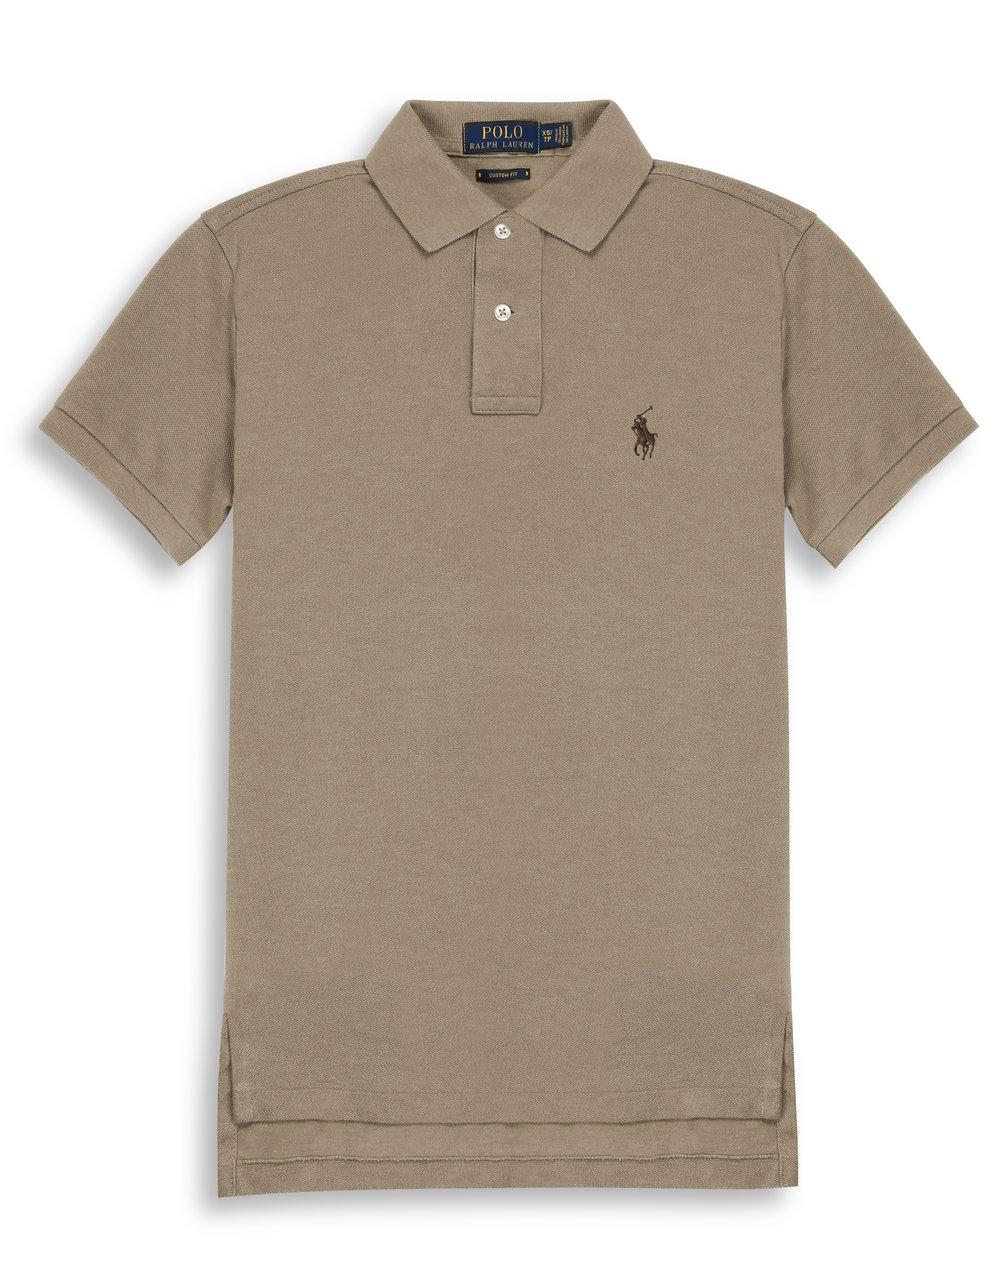 POLO RALPH LAUREN Classic-Fit Mesh Polo Shirt (8382651)